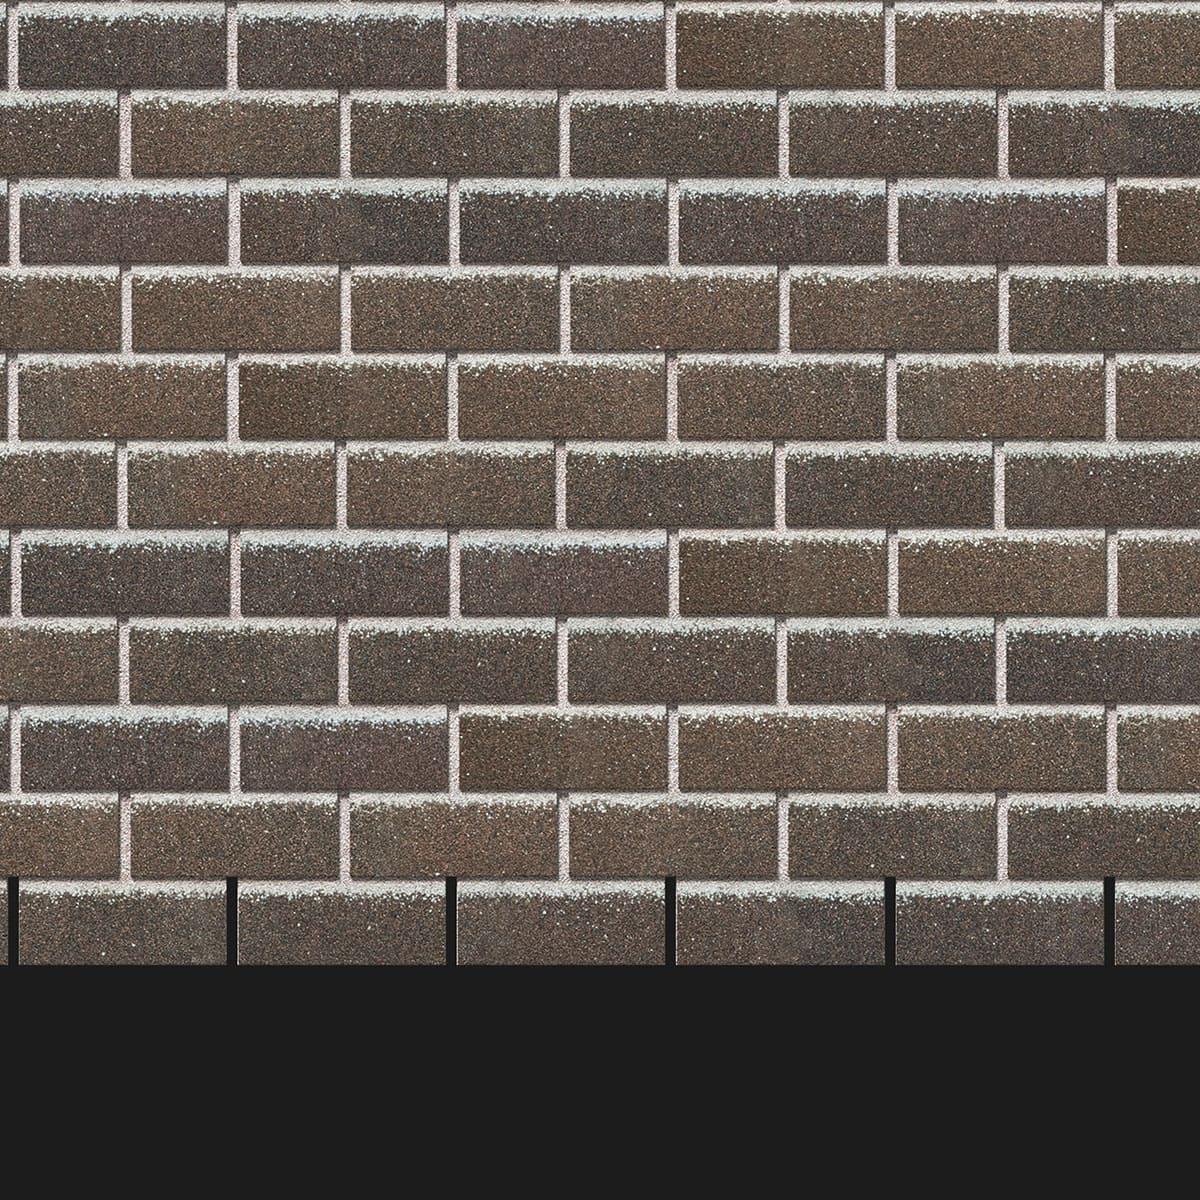 Фасадная плитка Döcke PREMIUM/ BRICK/ Зрелый каштан